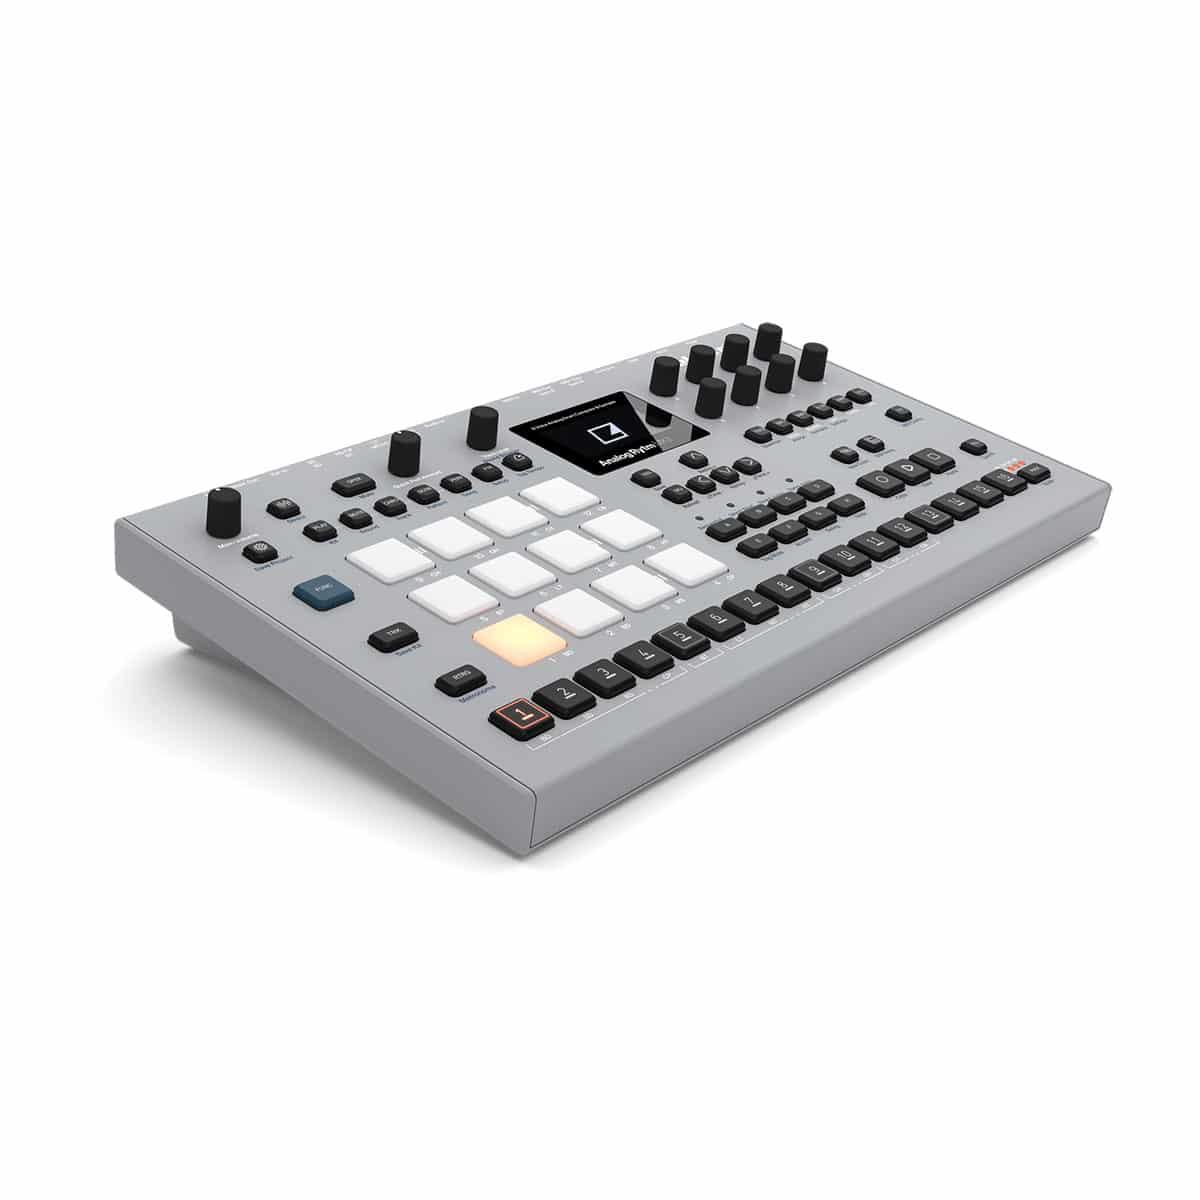 Elektron Analog Rytm MKII 01 Sintetizzatori e Drum Machine, Drum Machines Batterie Elettroniche